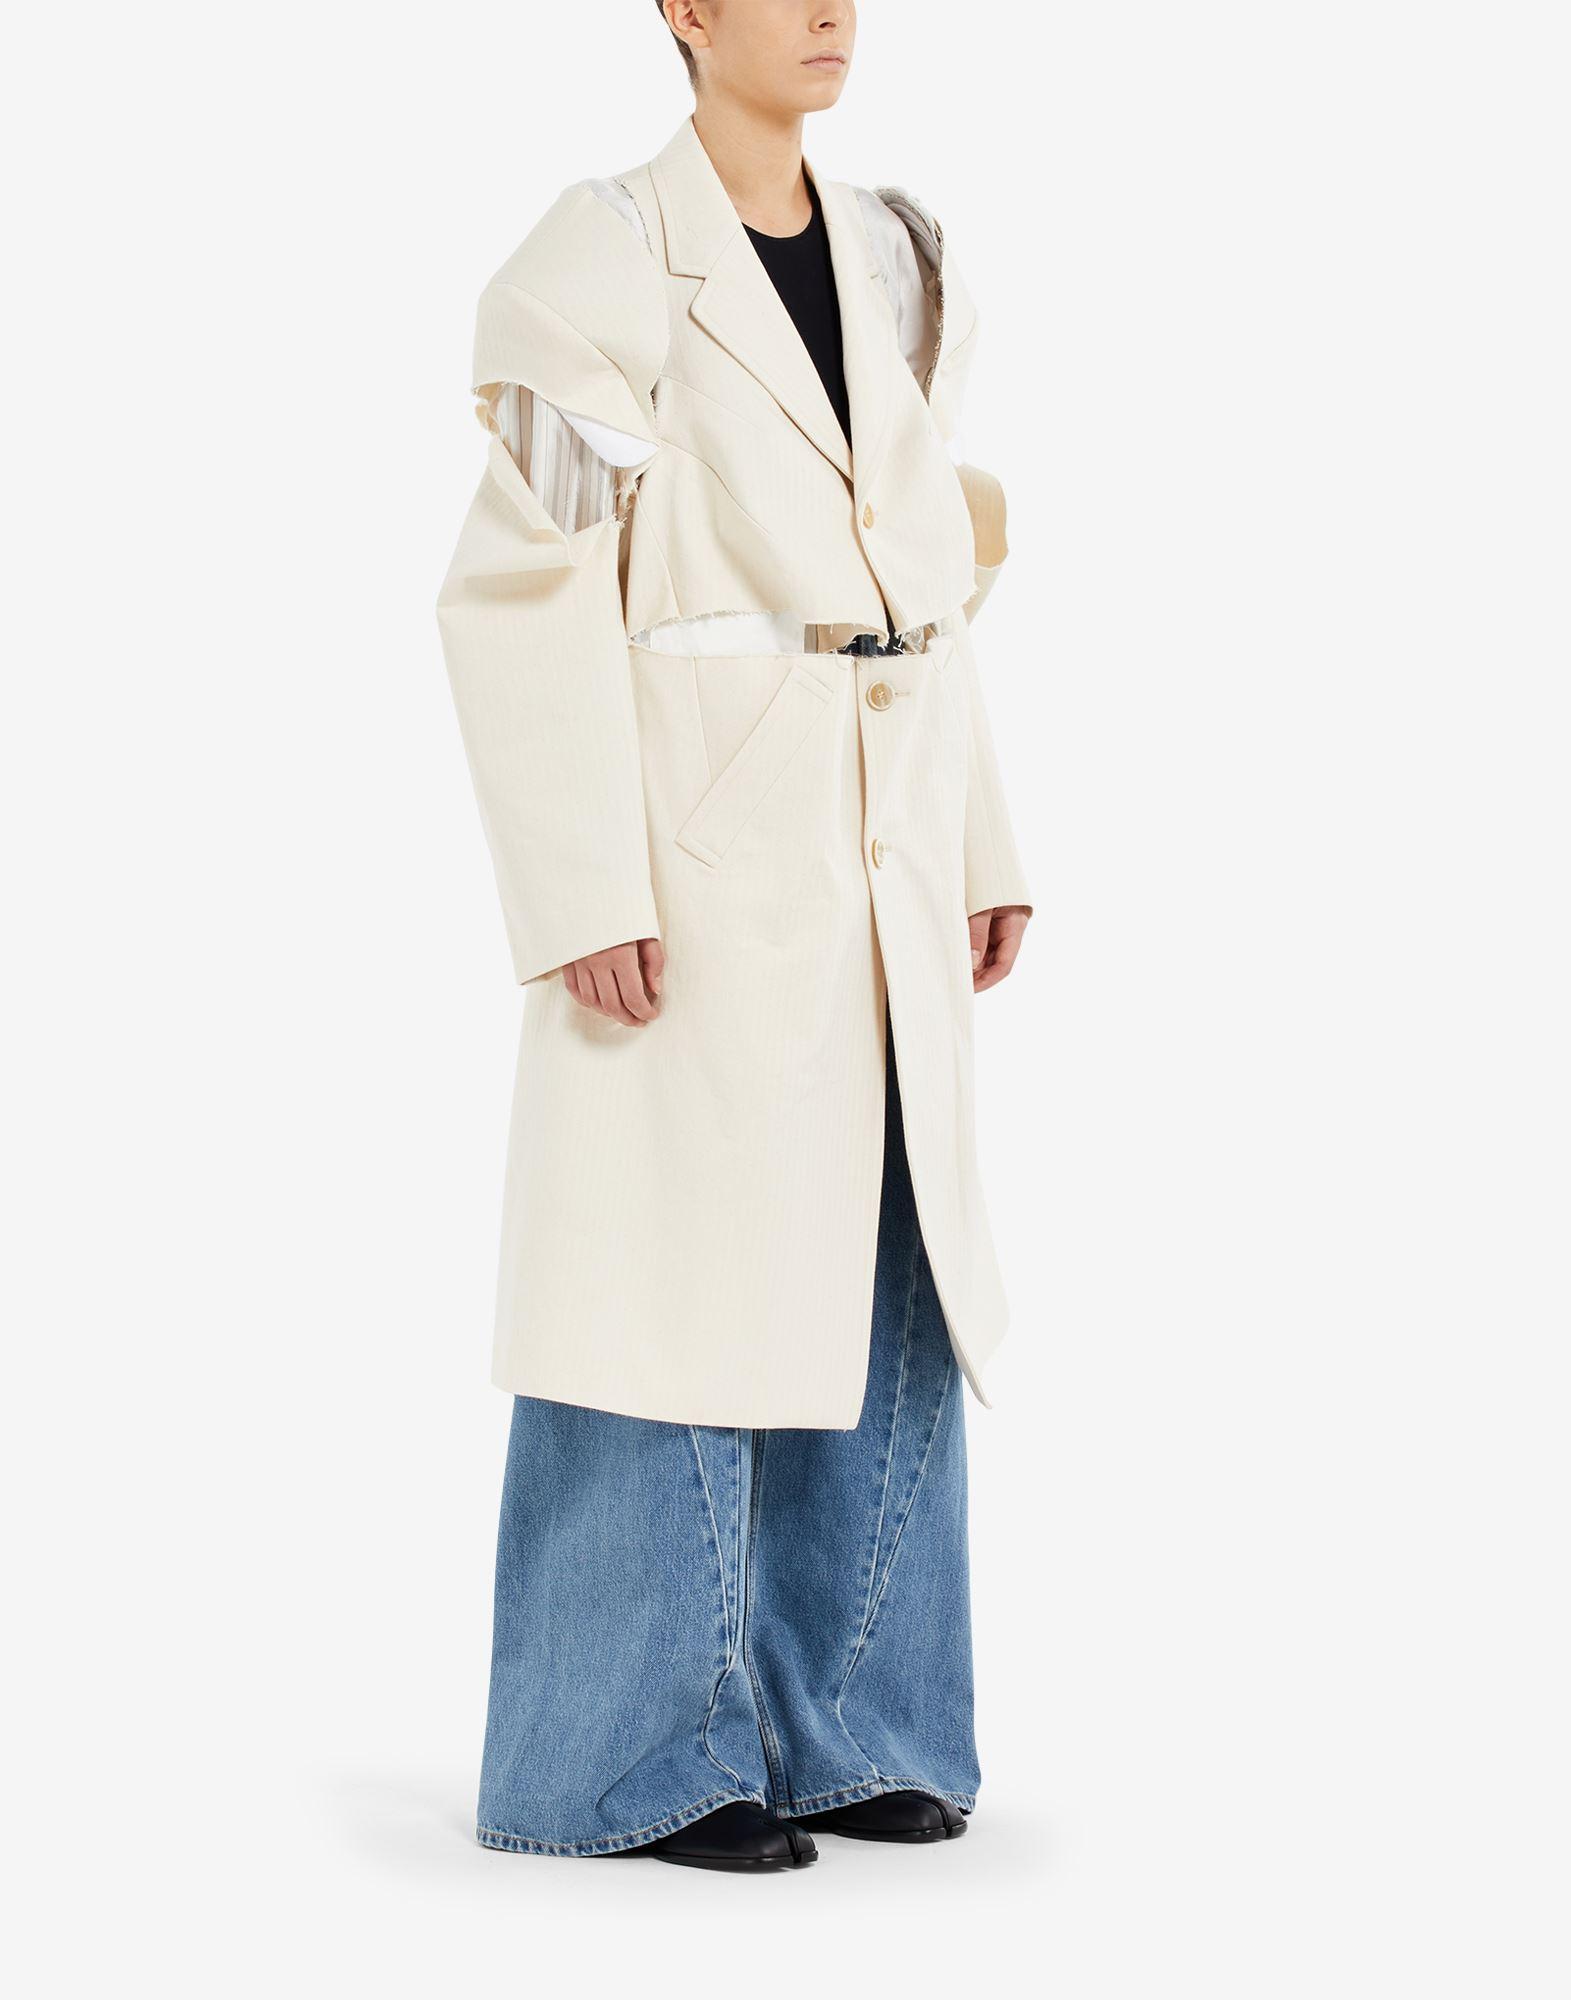 MAISON MARGIELA Tabi leather slip-ons Moccasins Woman b